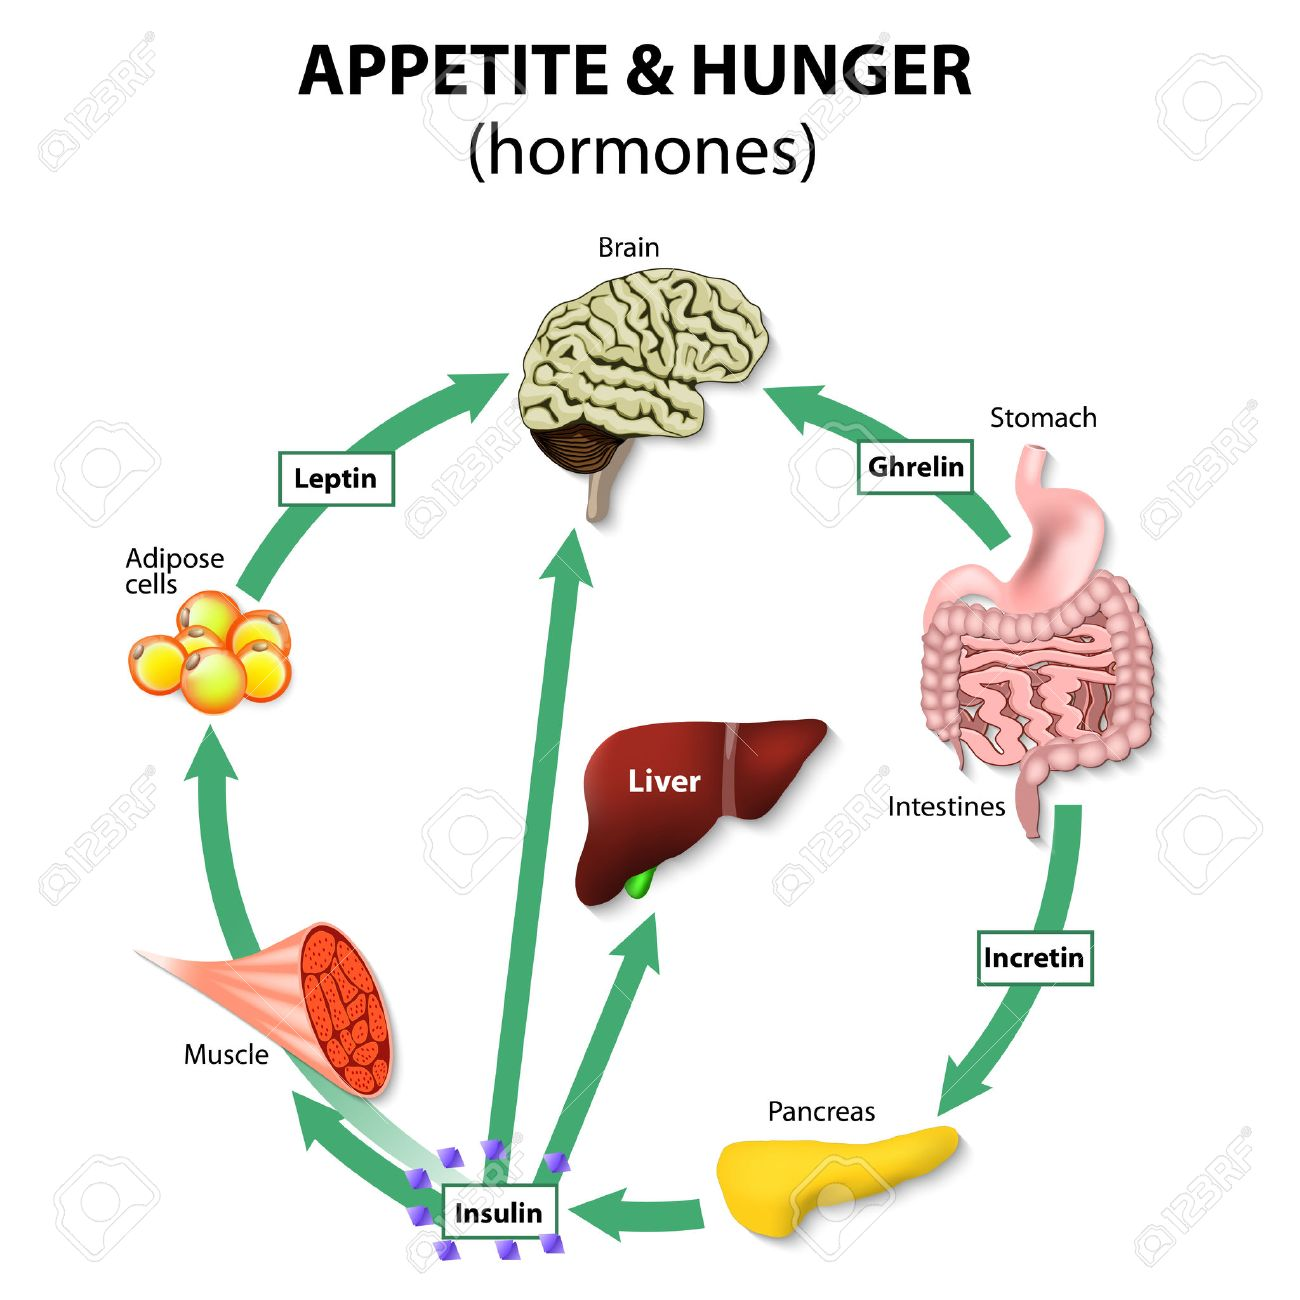 hormones appetite & hunger. human endocrine system. incretin